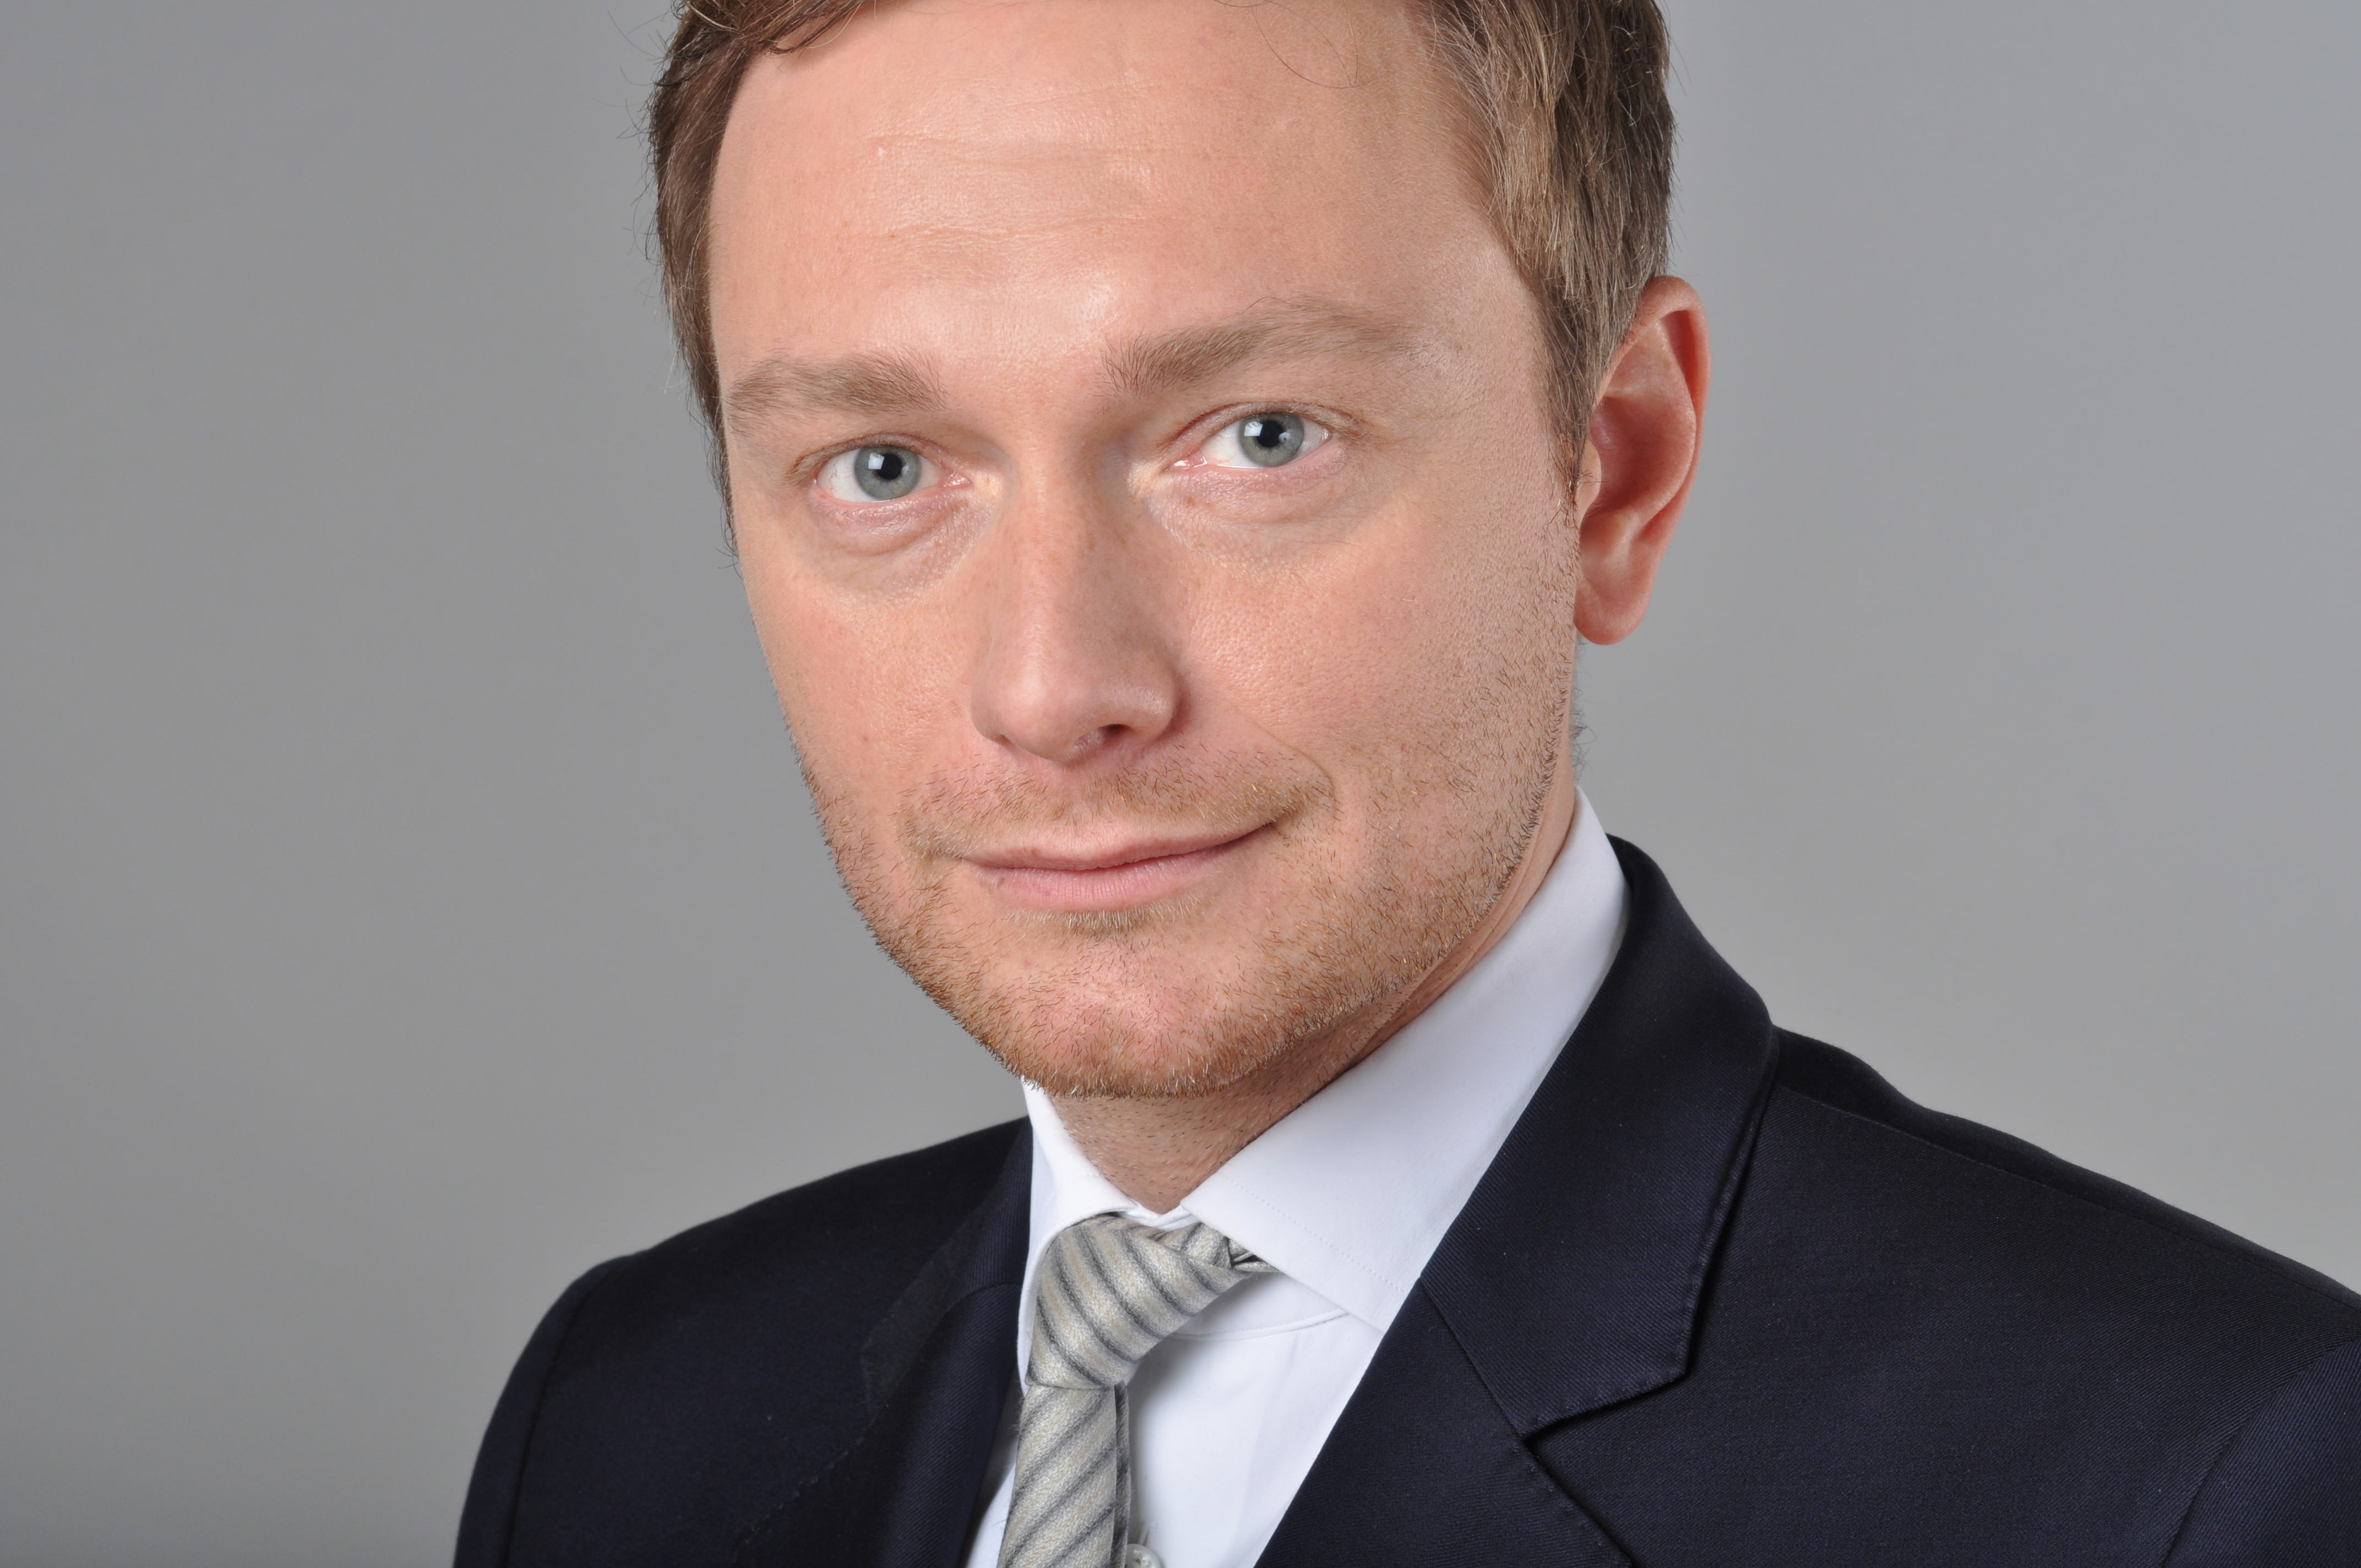 Fileri Christian Lindner Fdp Jpg